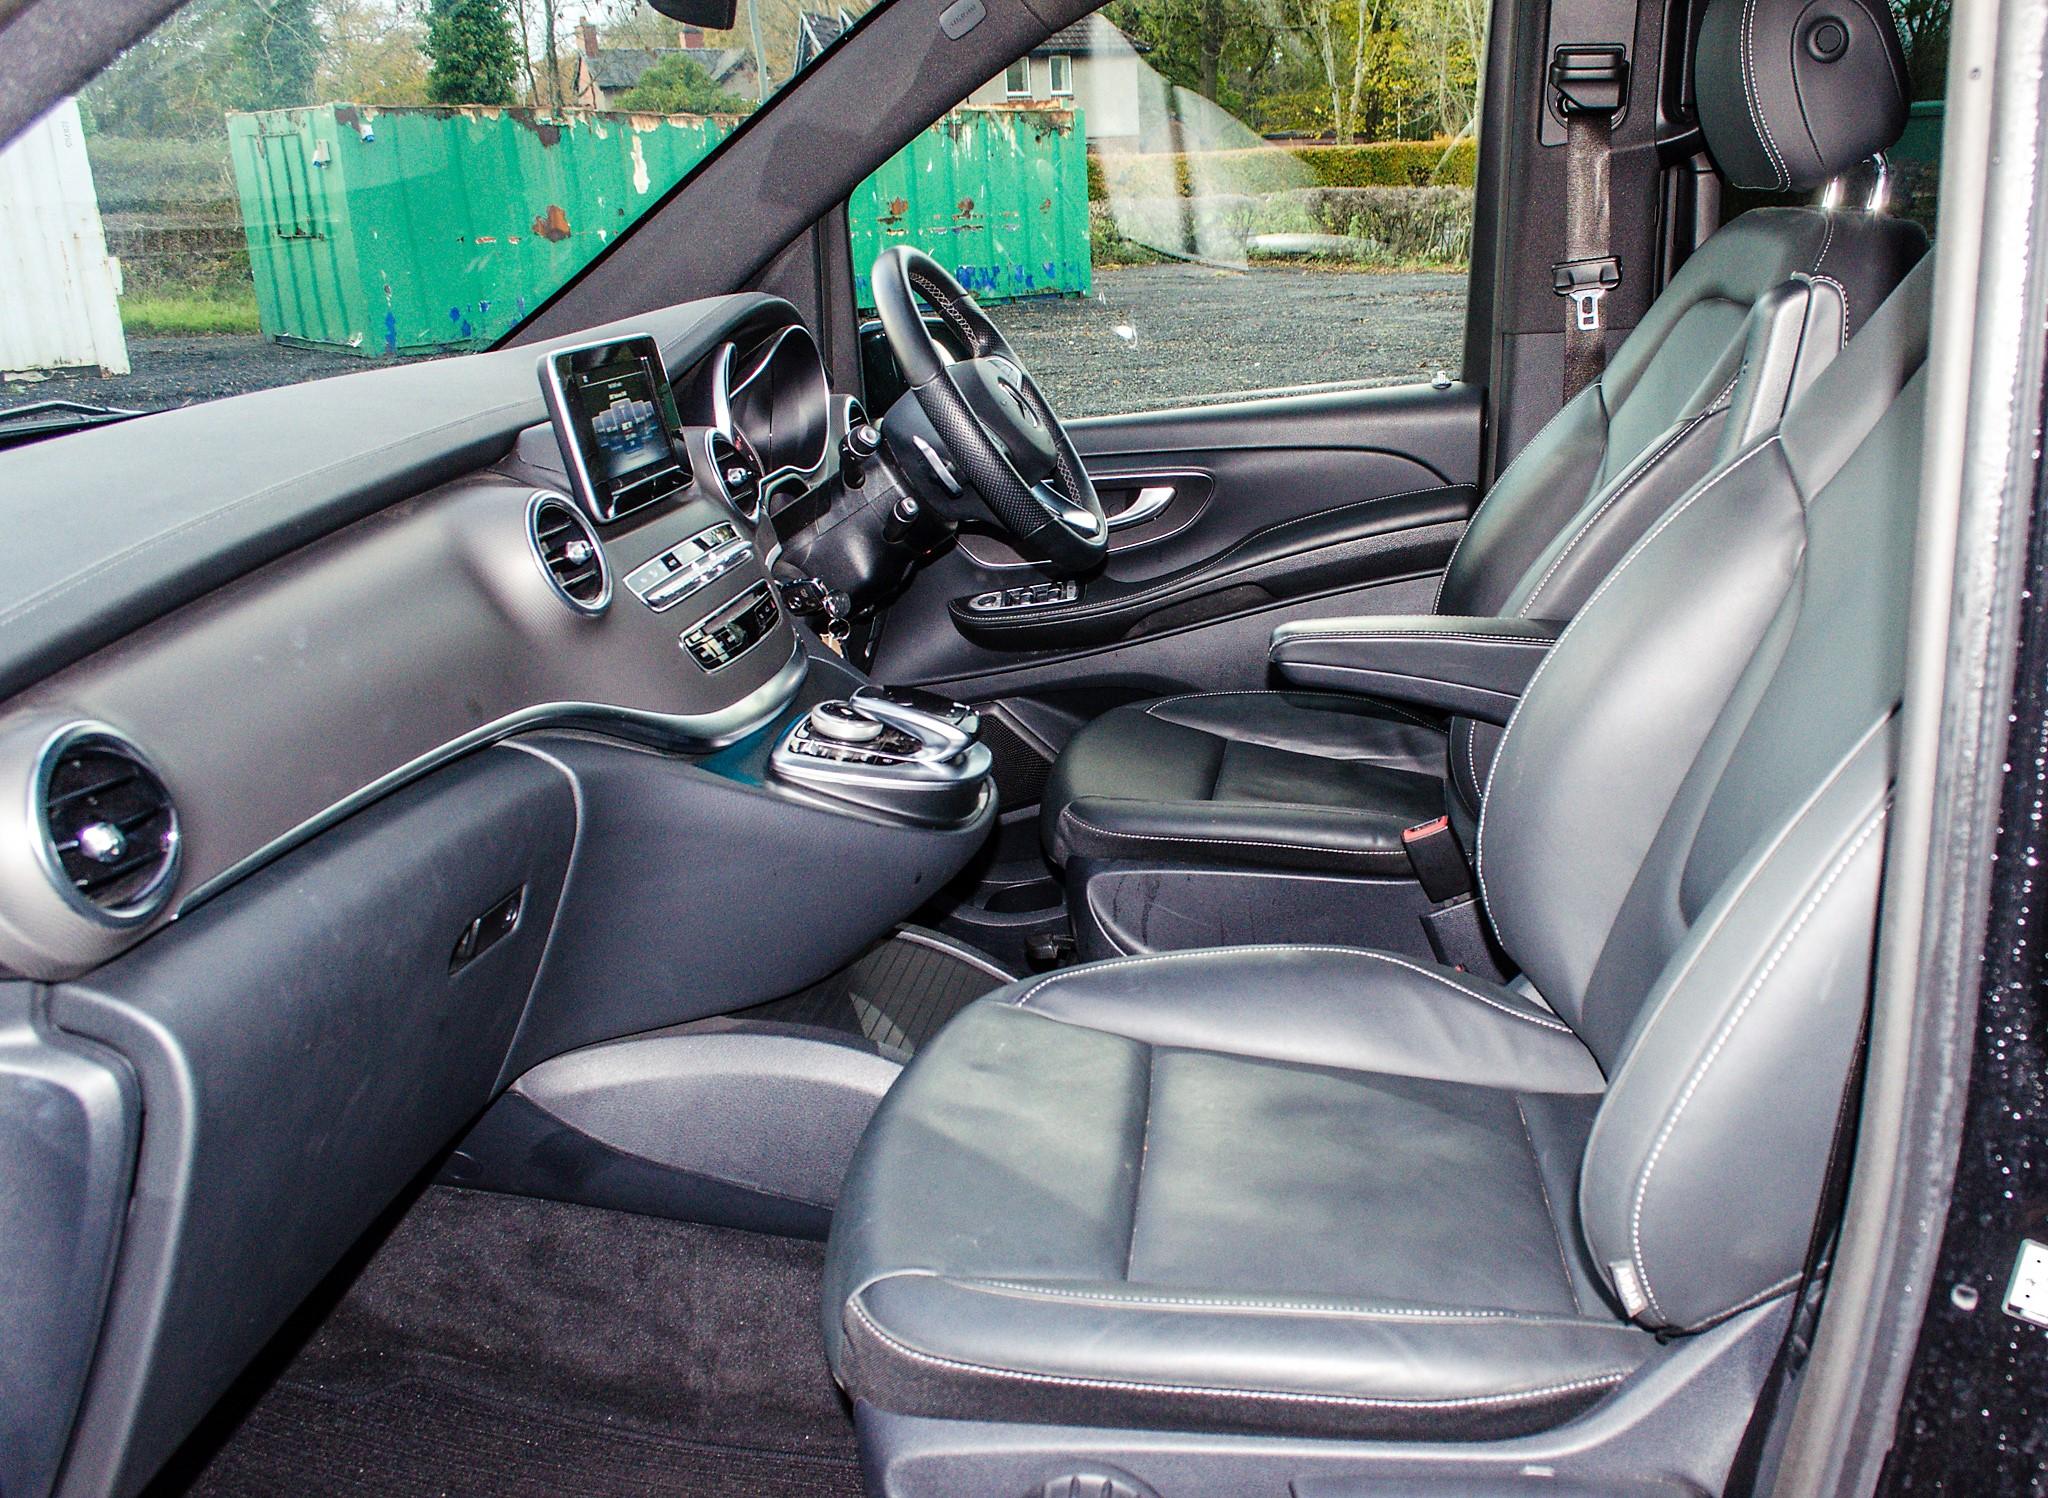 Mercedes Benz V250 Sport Bluetec XLWB auto diesel 8 seat MPV Reg No: FY68 JTO Date of First - Image 17 of 27